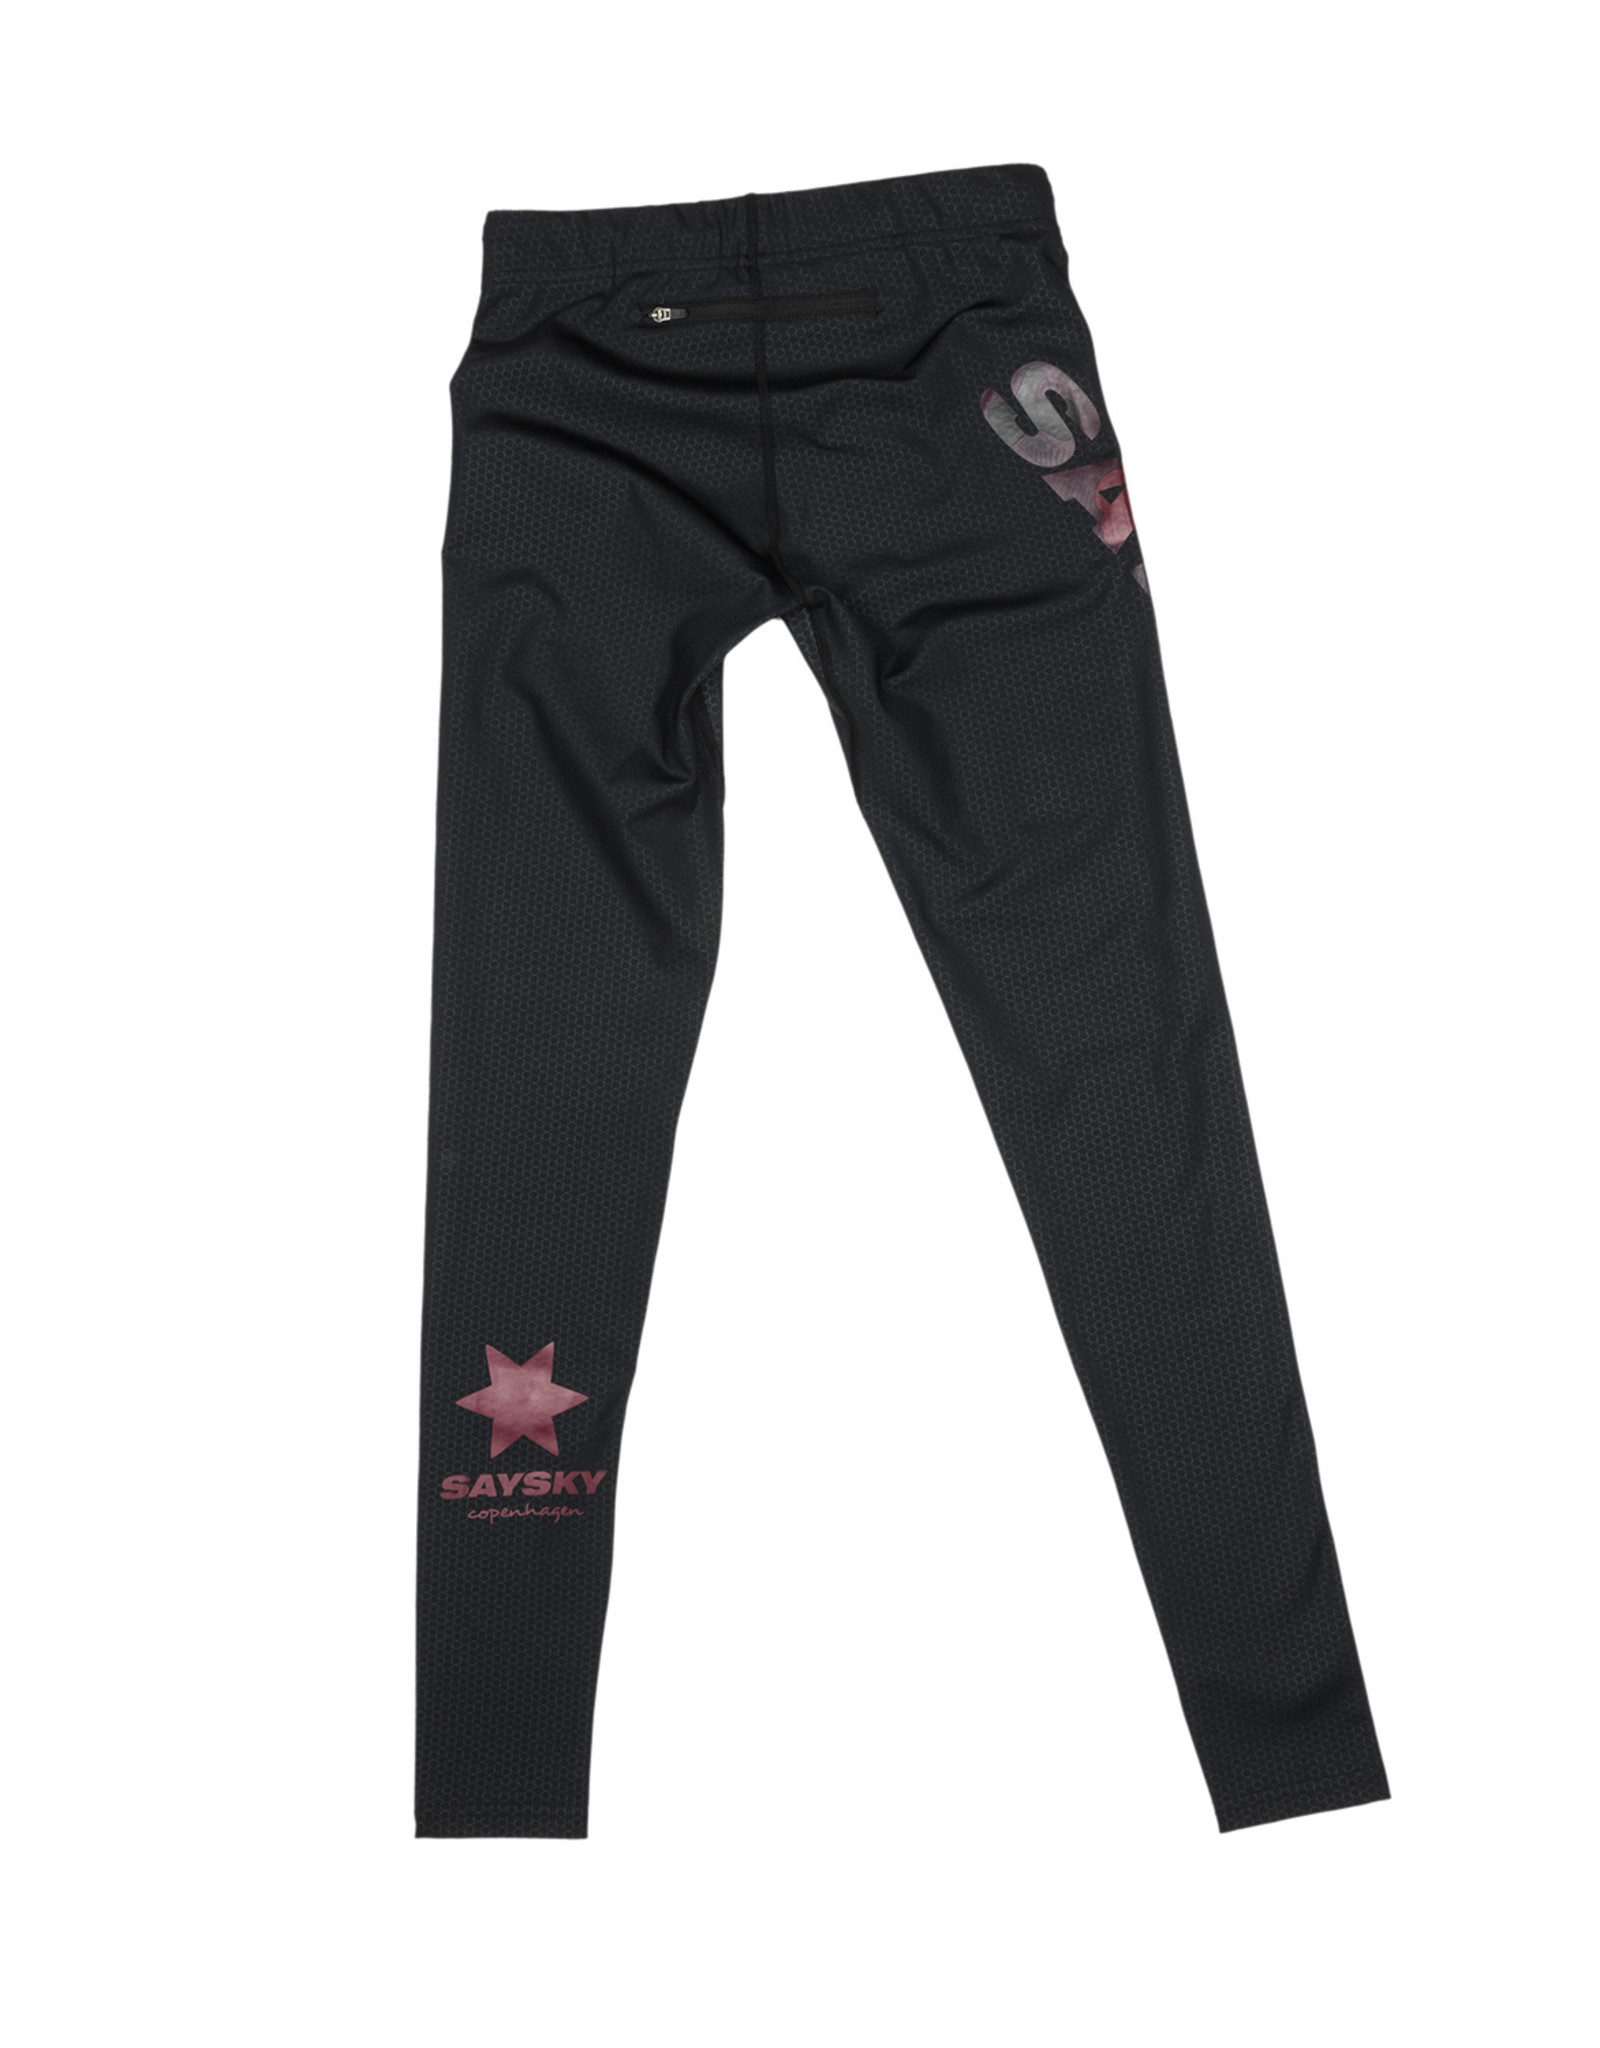 Saysky Blaze tights (GMRLT02)